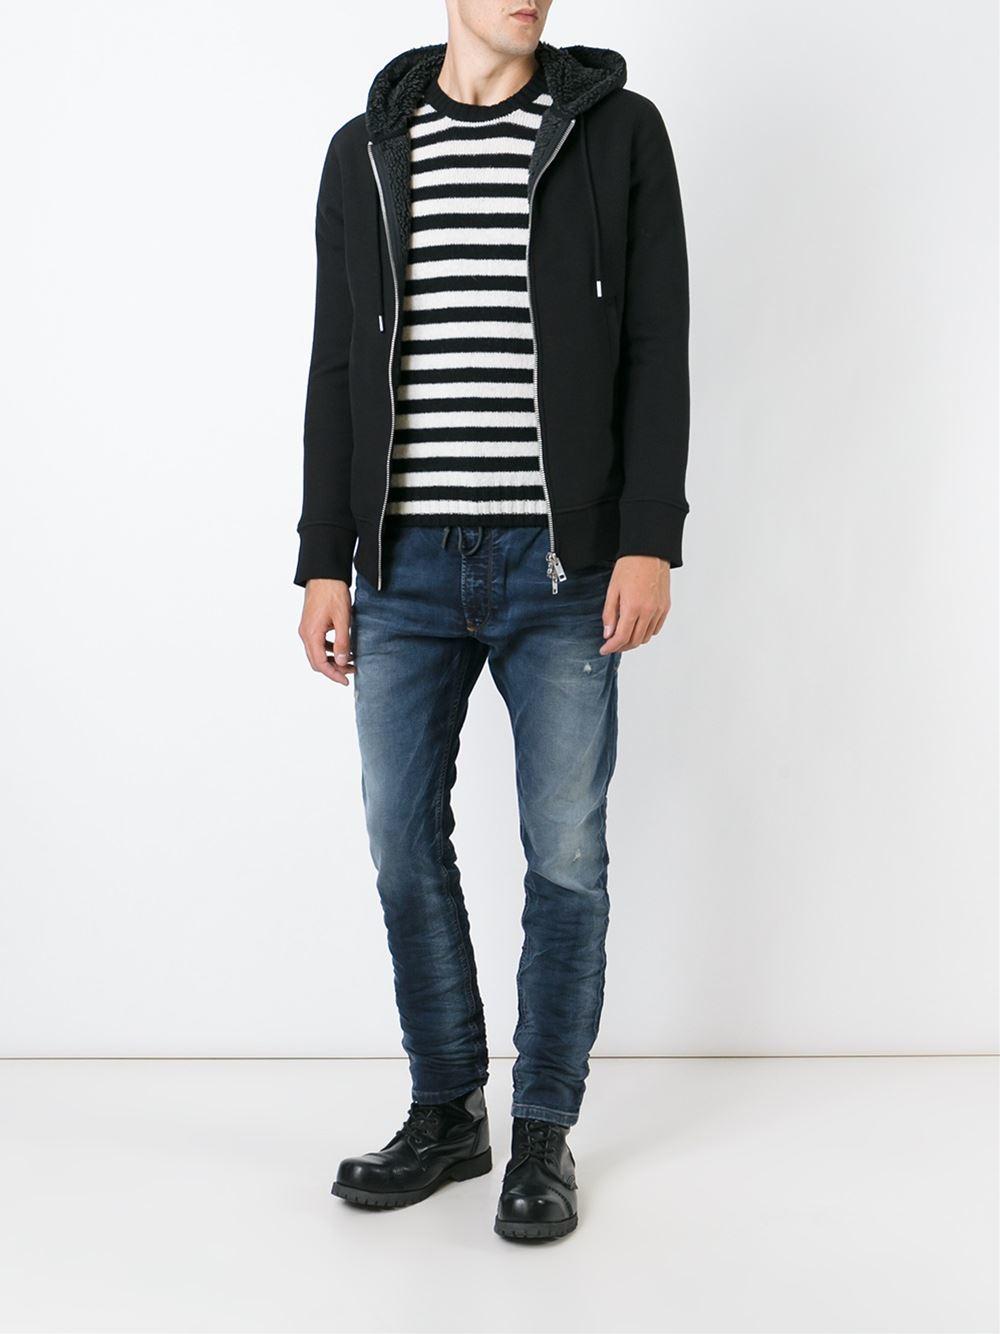 Diesel S Mifun Jacket In Black For Men Lyst